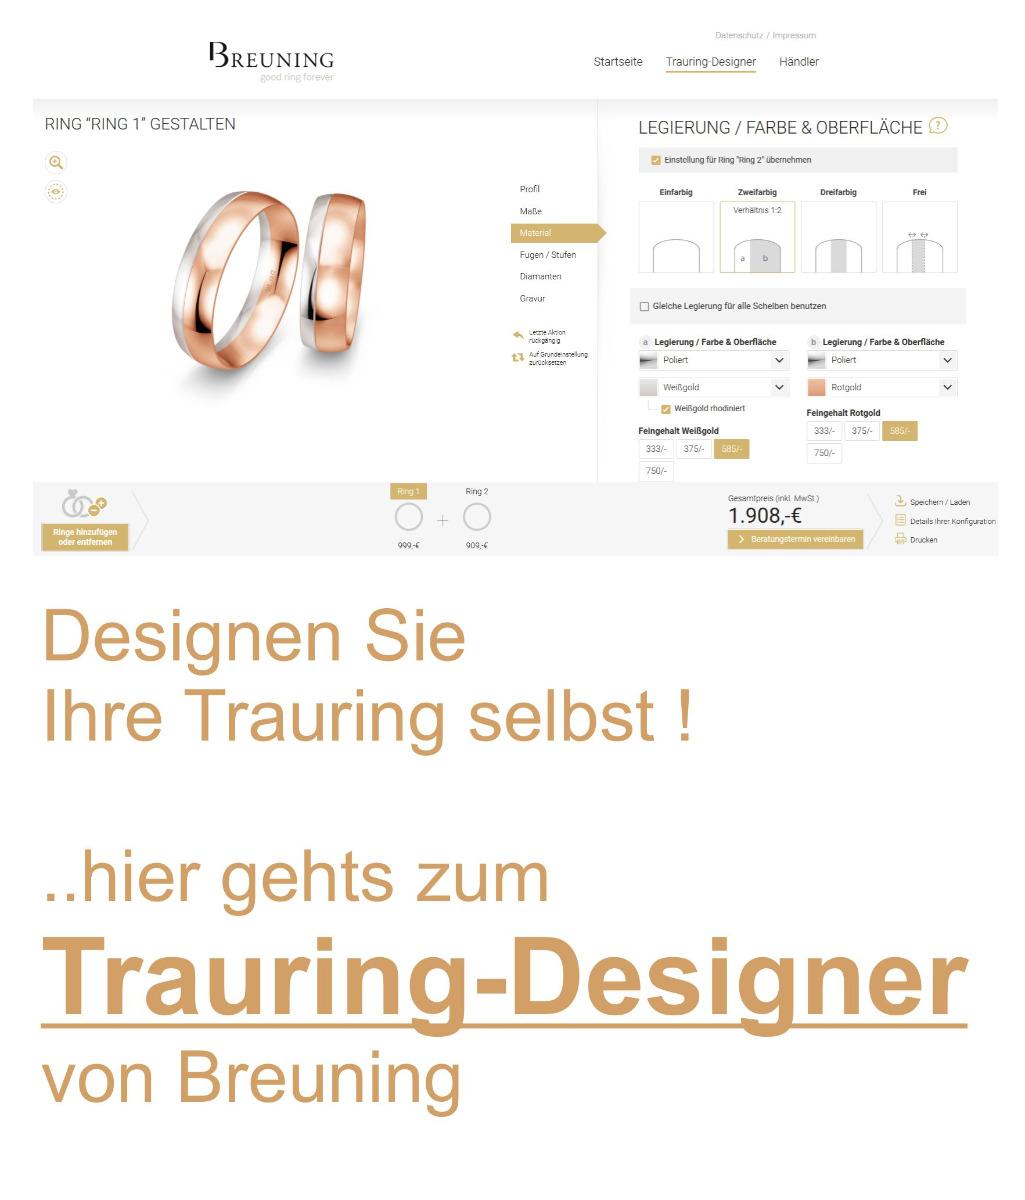 Trauring Designer